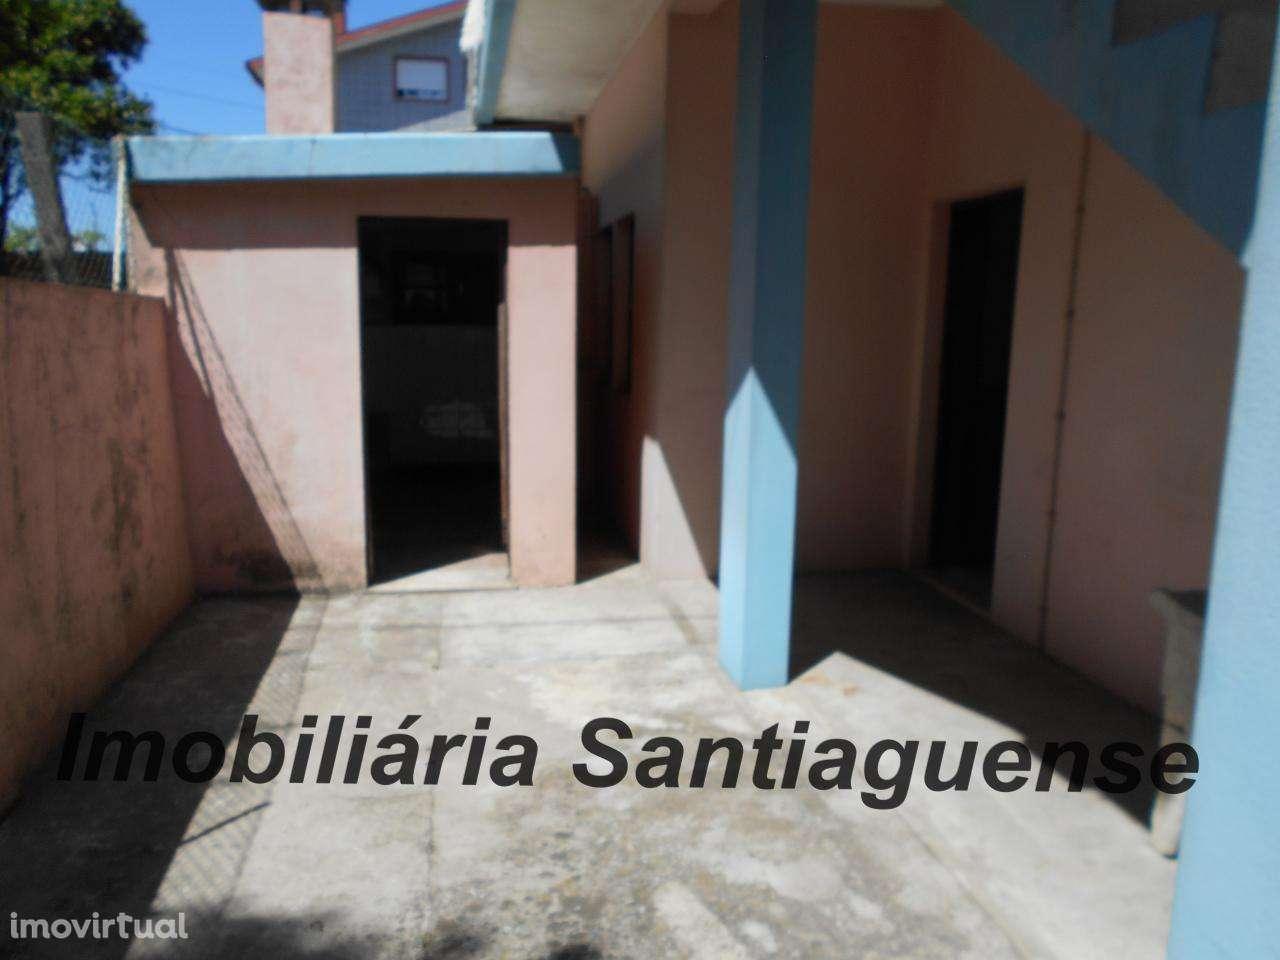 Loja para arrendar, Oliveira de Azeméis, Santiago de Riba-Ul, Ul, Macinhata da Seixa e Madail, Oliveira de Azeméis, Aveiro - Foto 7